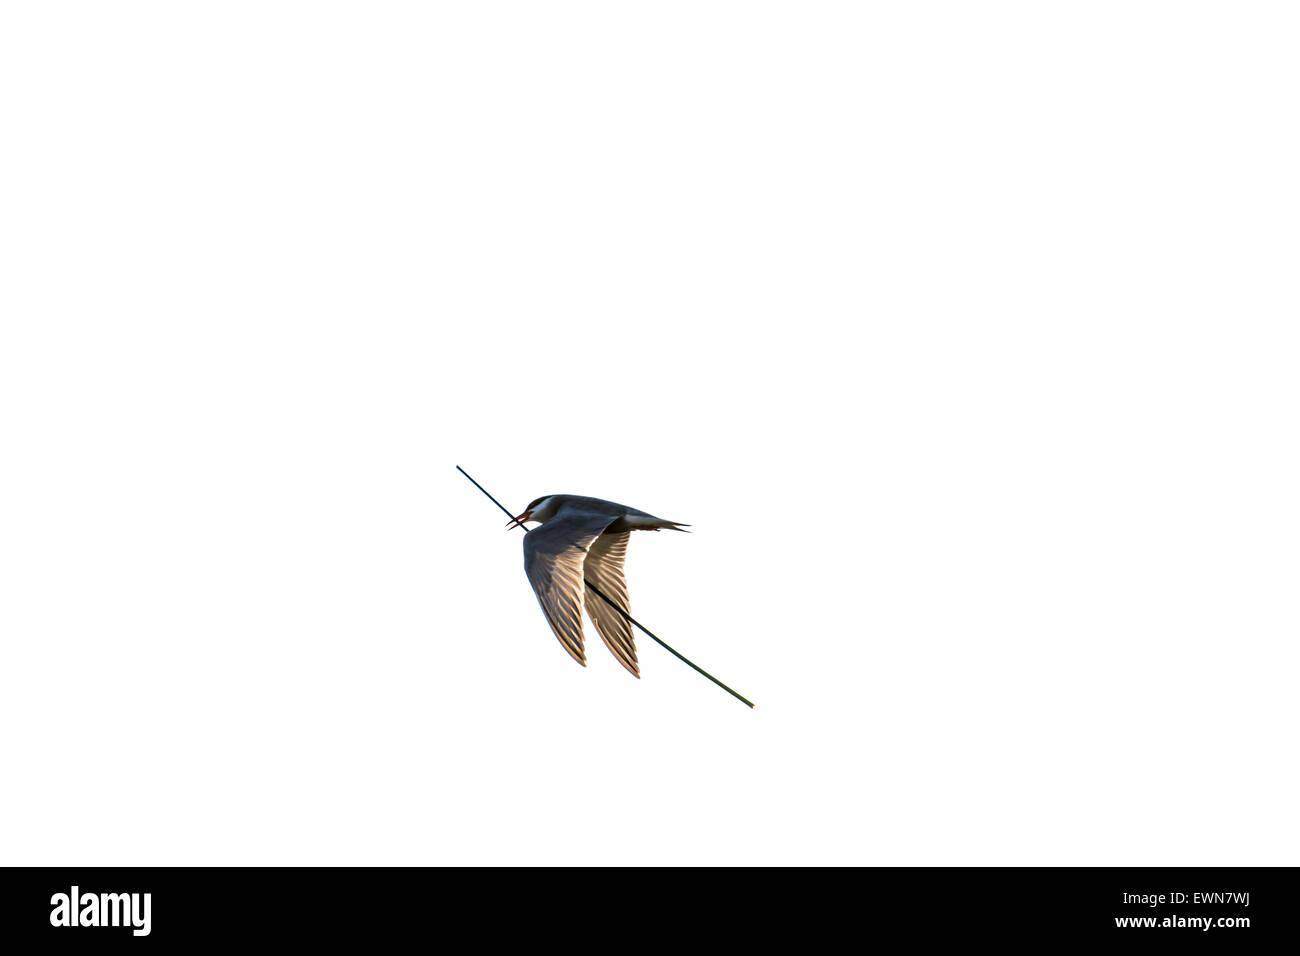 Whiskered tern (Chlidonias hybrida / Chlidonias hybridus) flying with stalk in beak for nest building against white - Stock Image